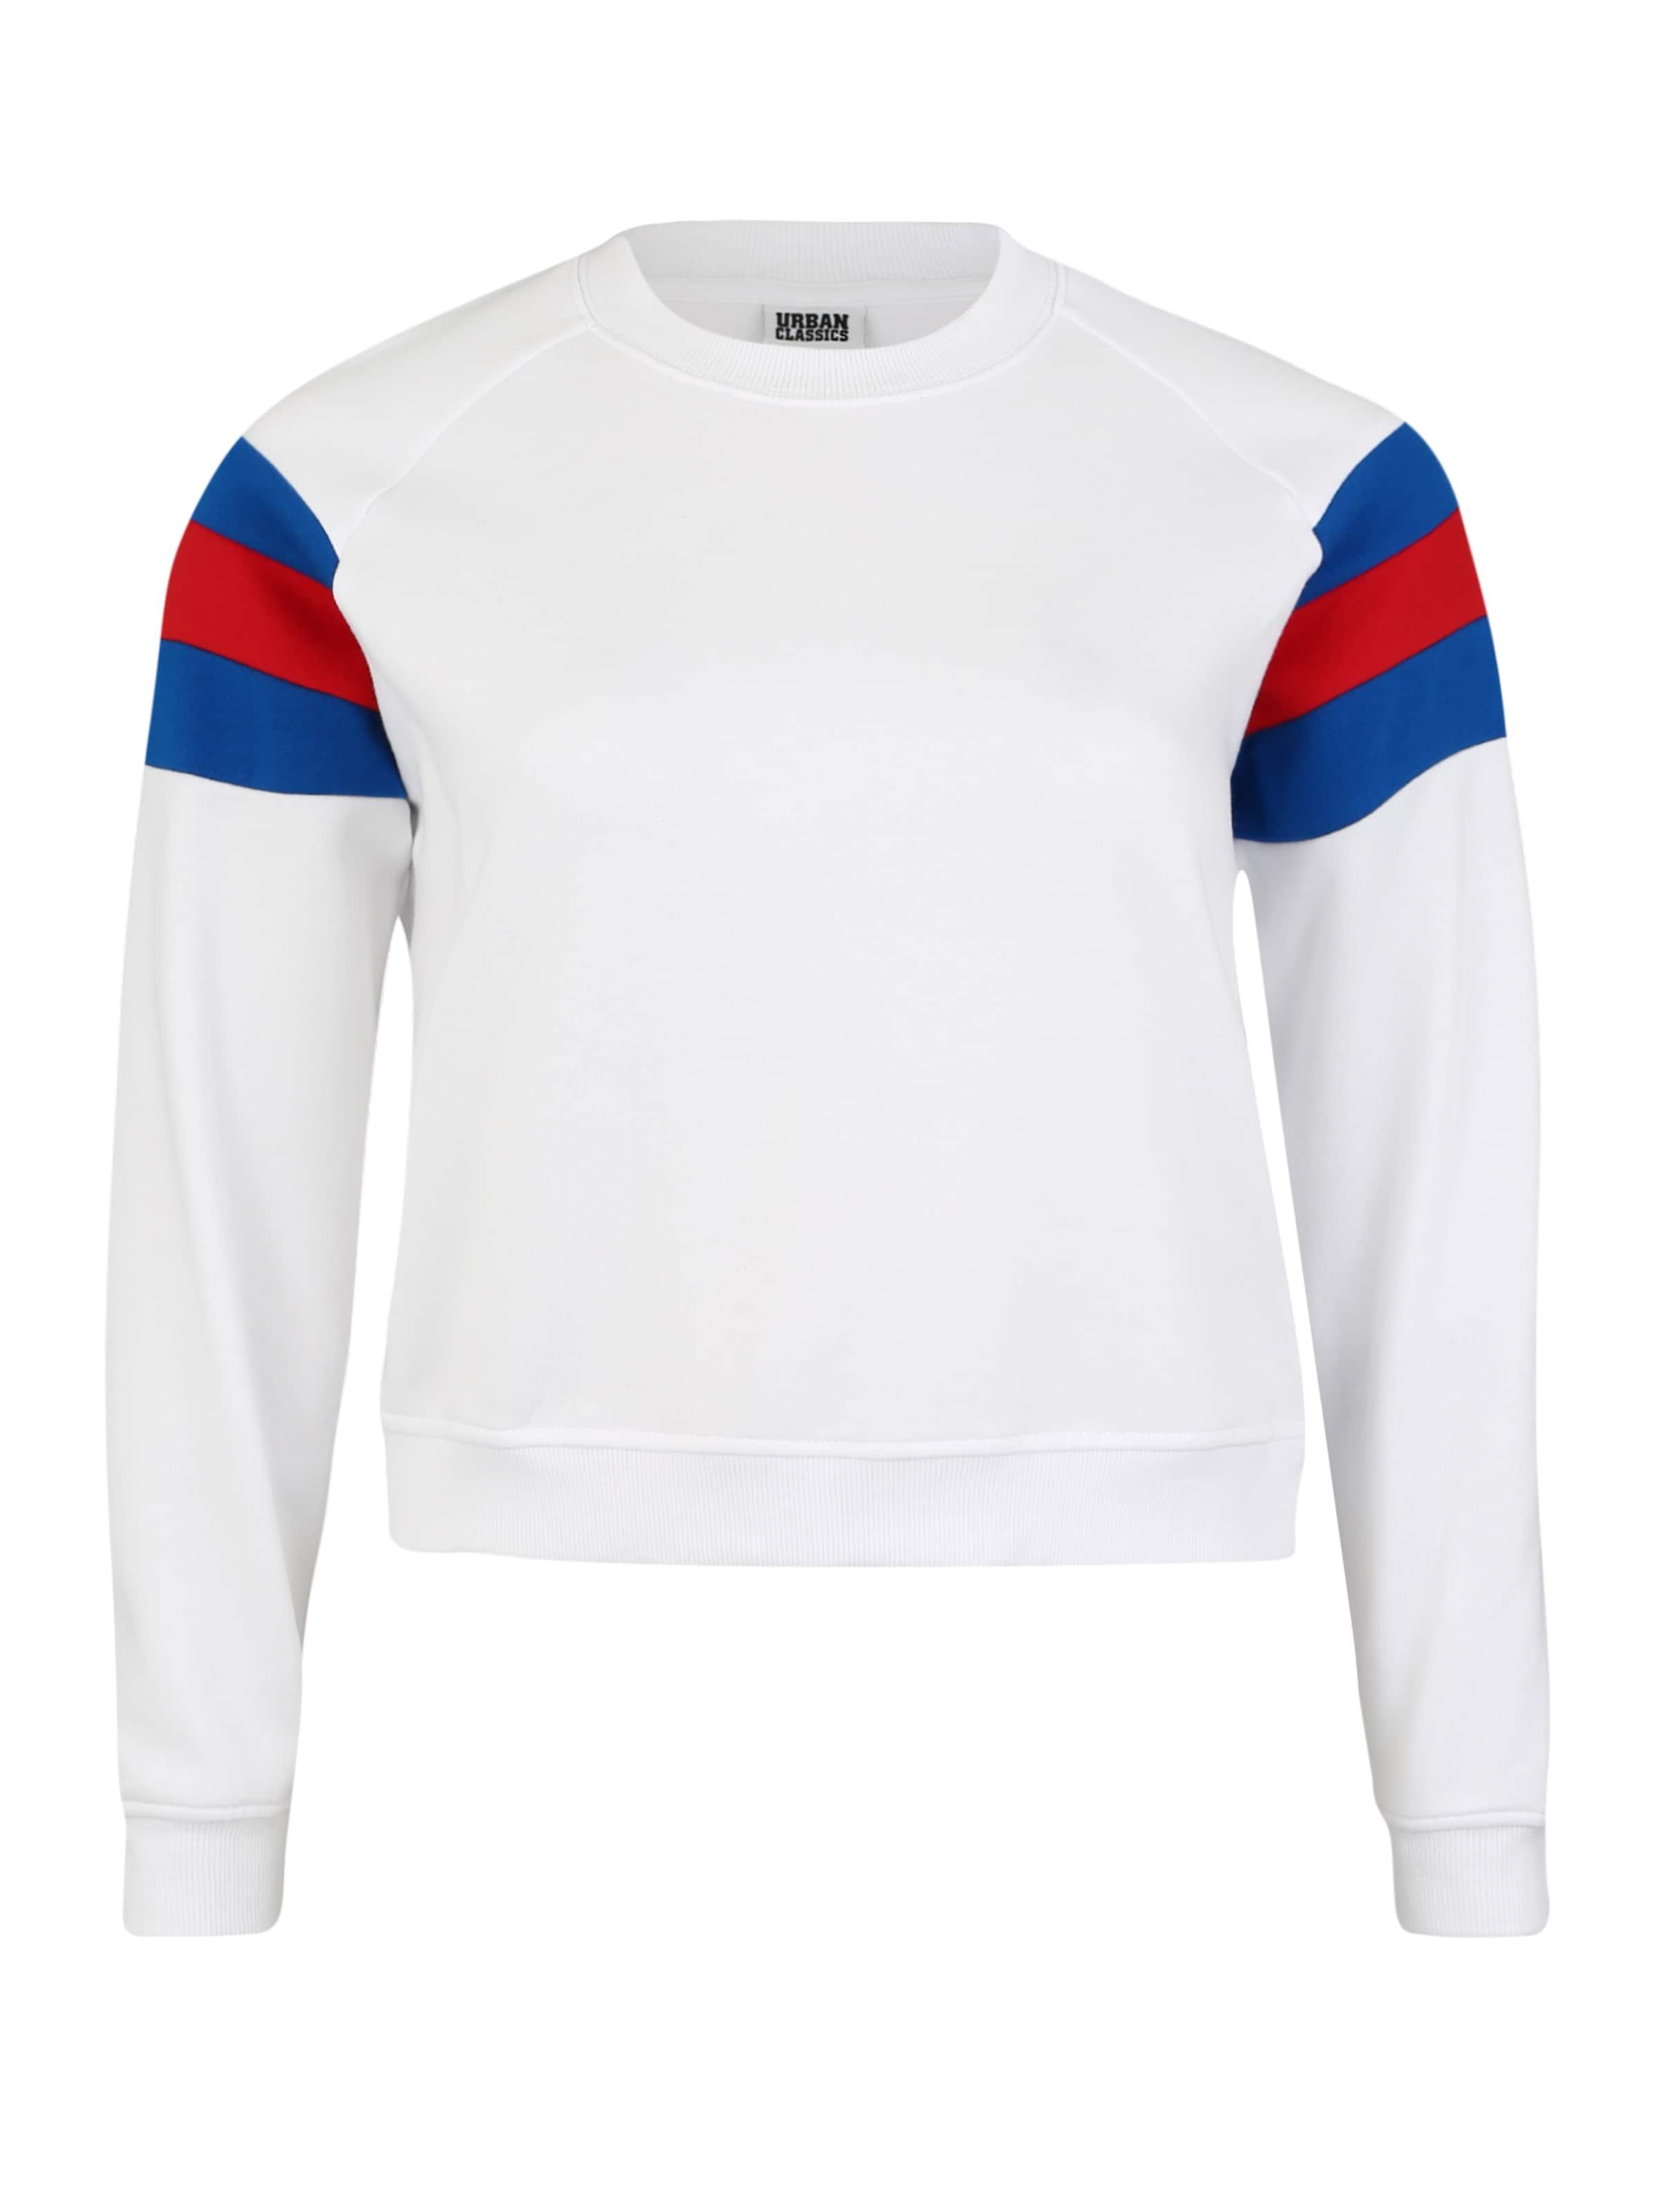 Classics Curvy BlauRot Urban Sweatshirt Weiß In PkXlZiTuwO